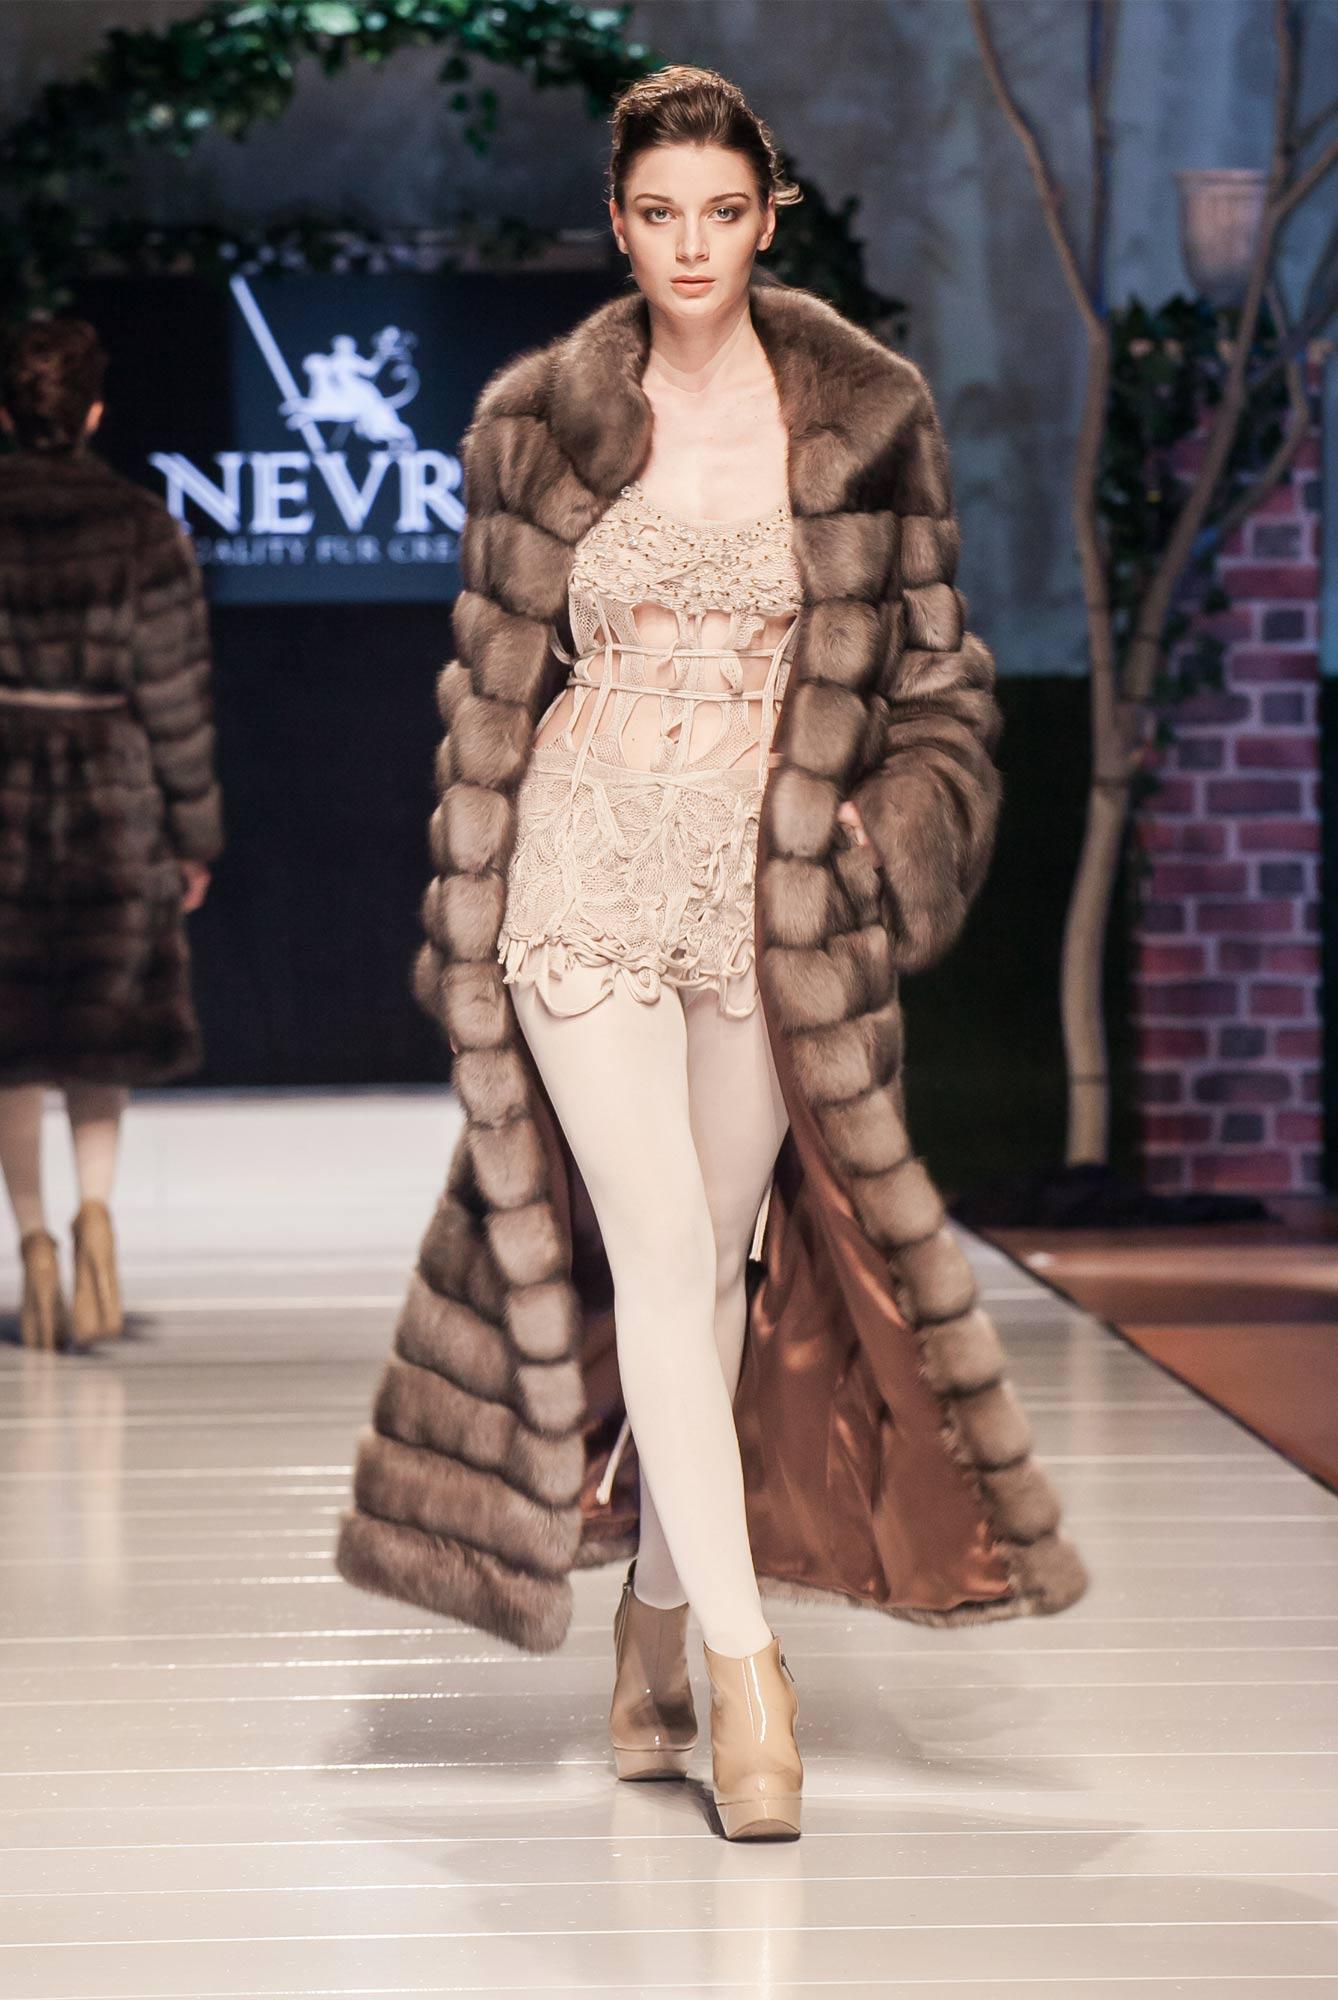 gala, fur fashion show, fea 2014   nevris wow! dfpyova